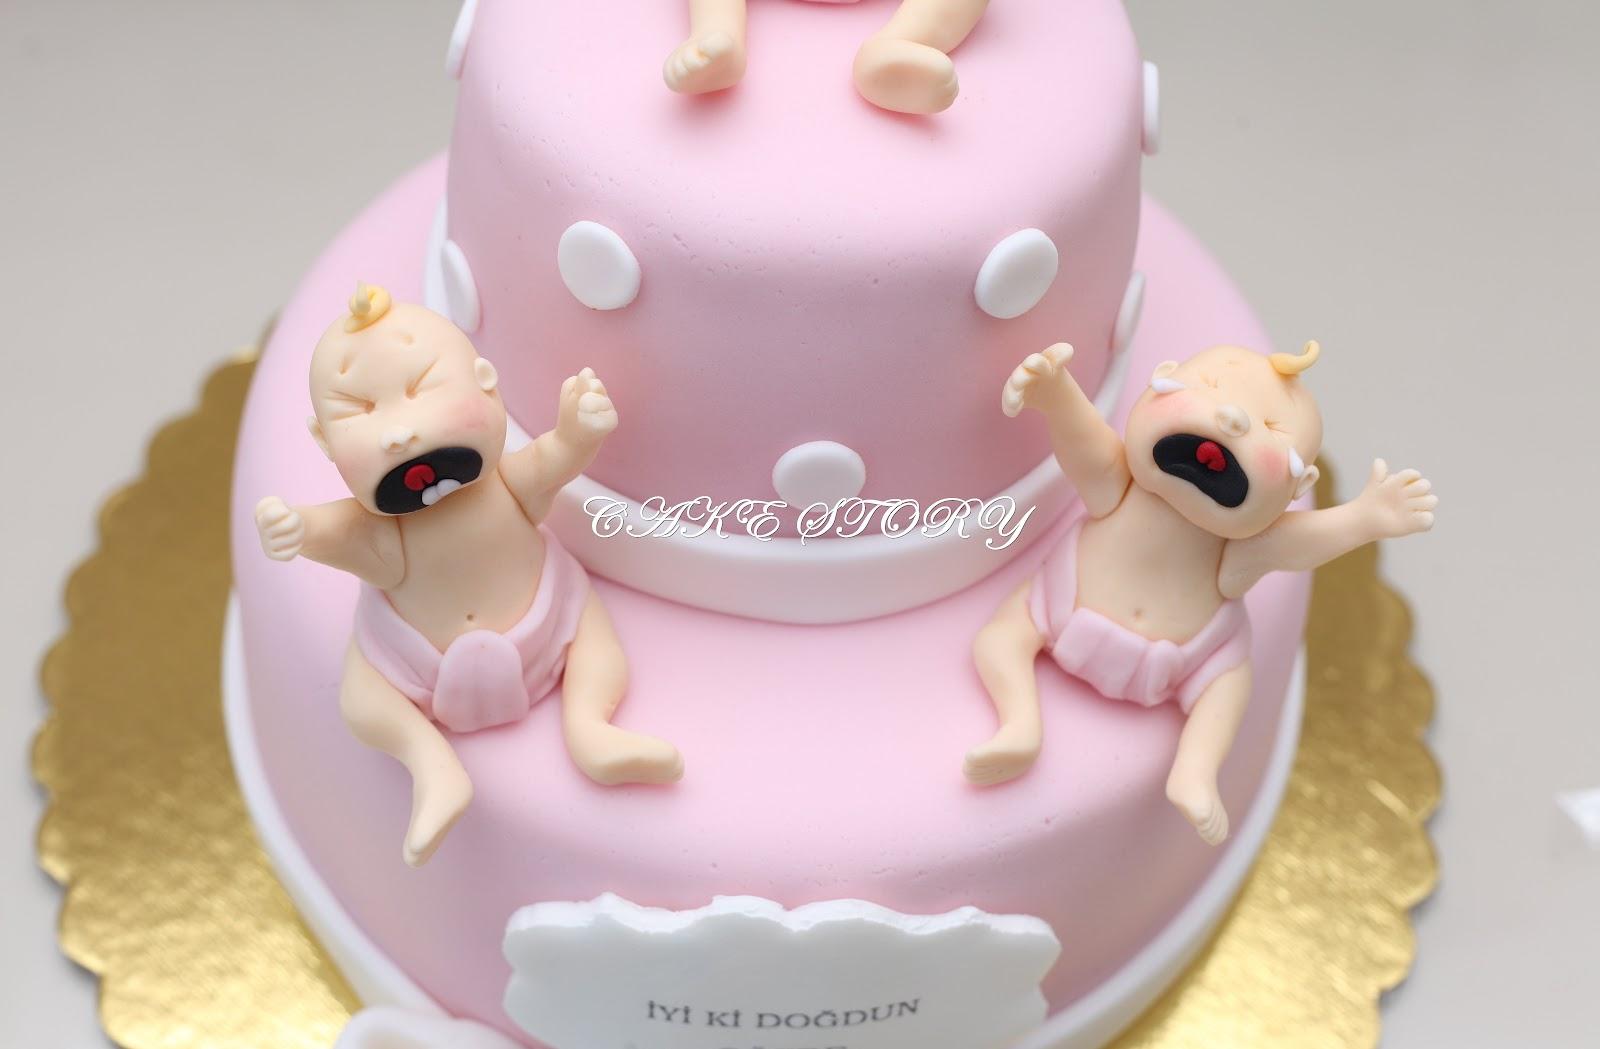 Birthday Cake Images Baby ~ Cake story: crying babies birthday cake